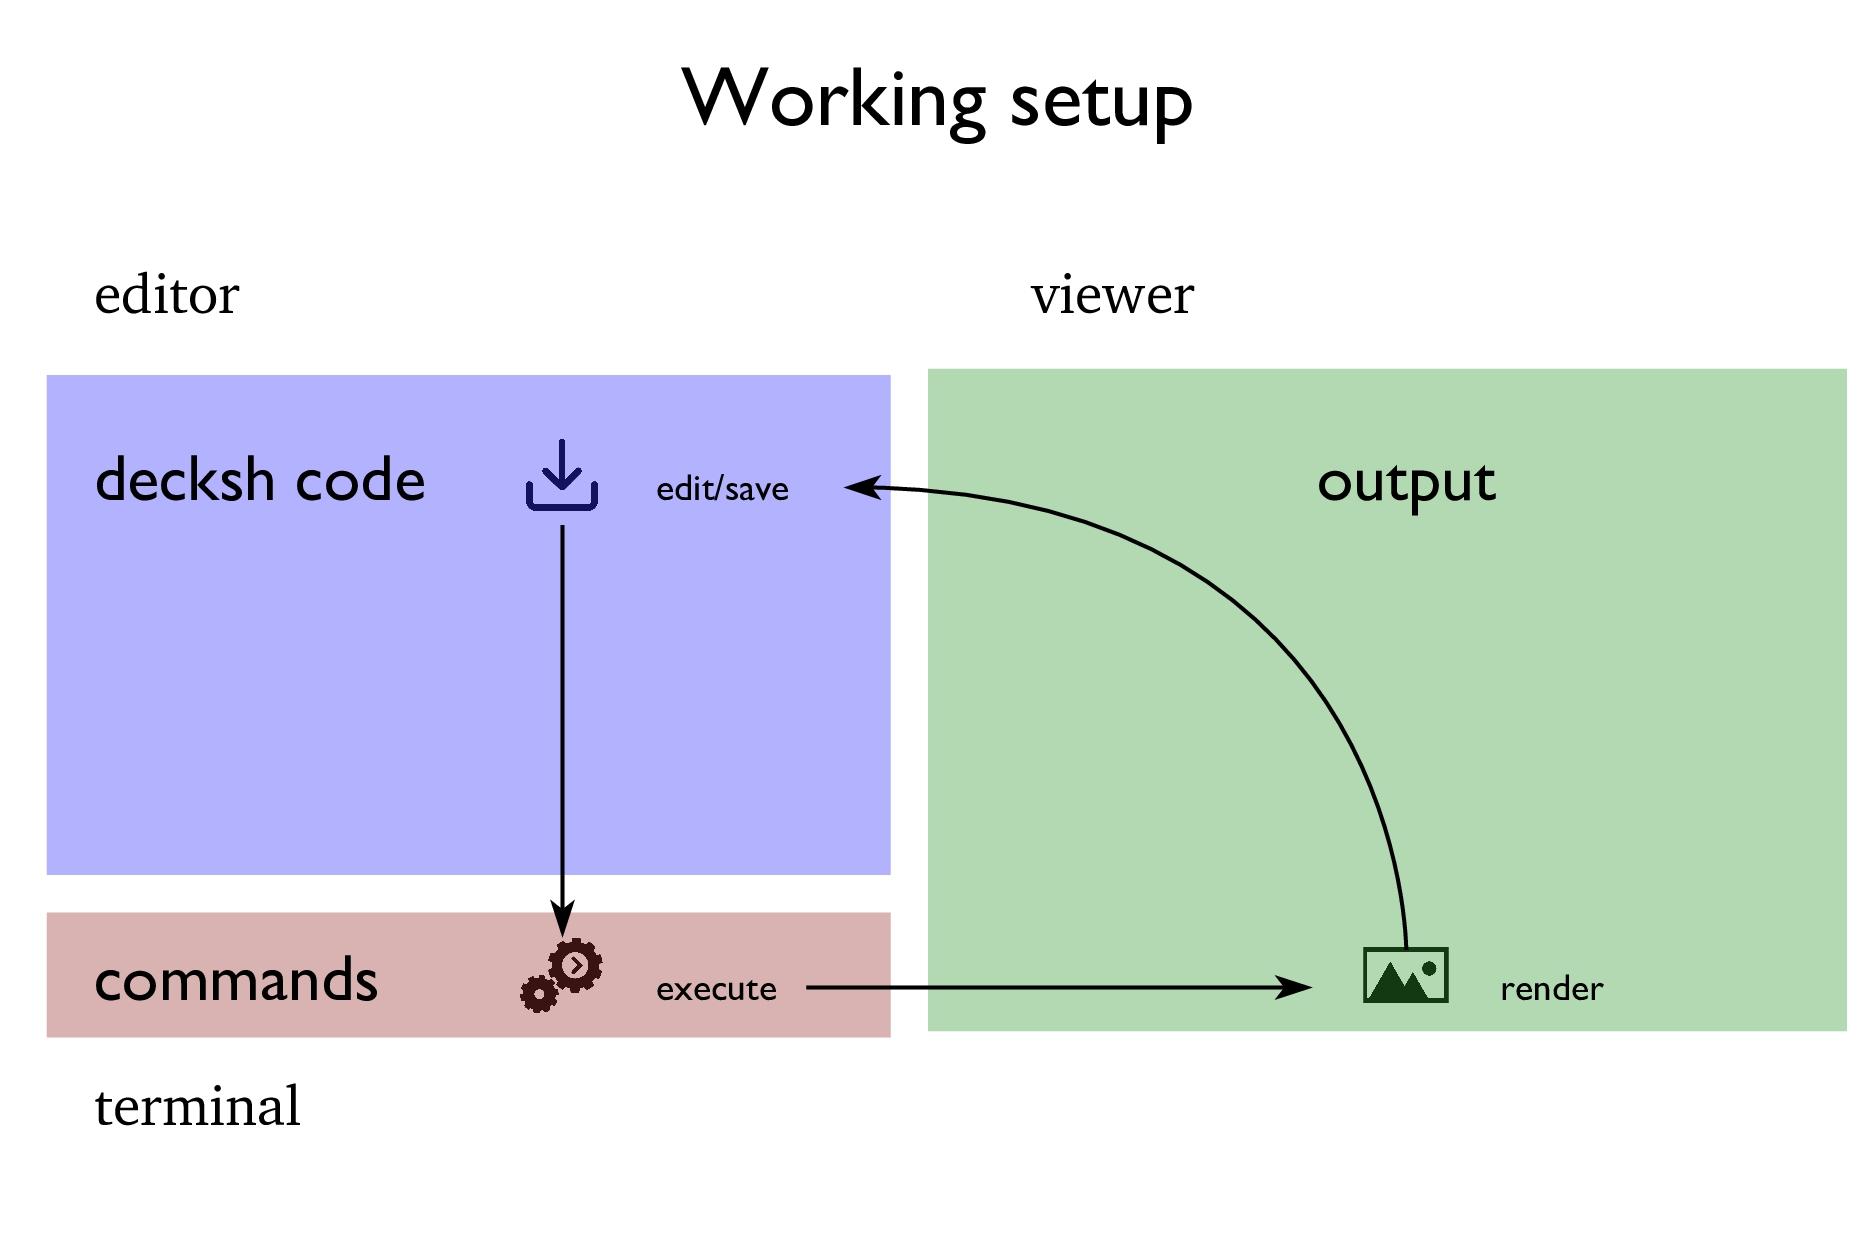 Working setup decksh code commands output edit/...